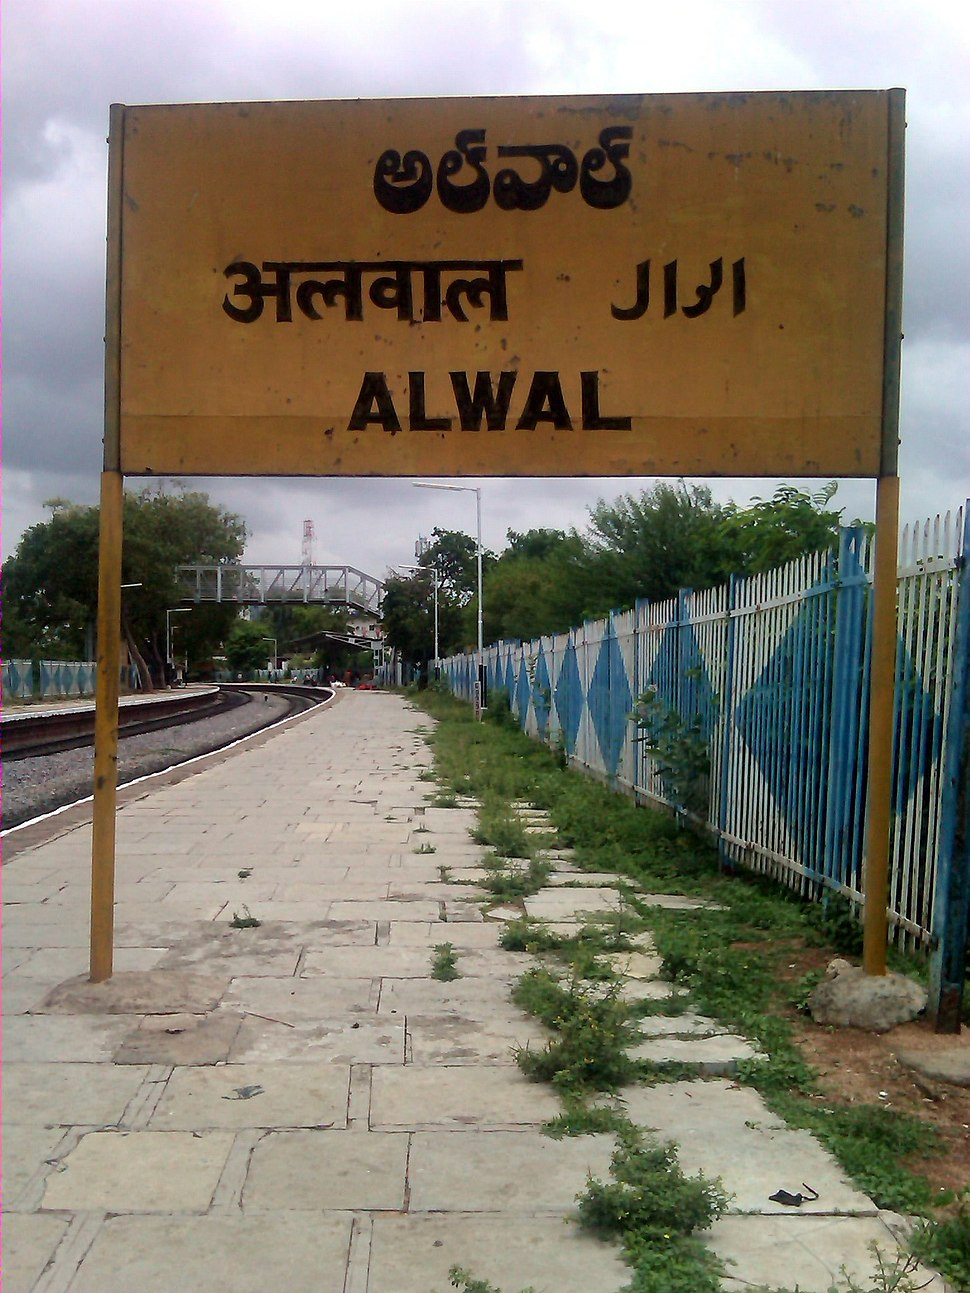 Alwal Board